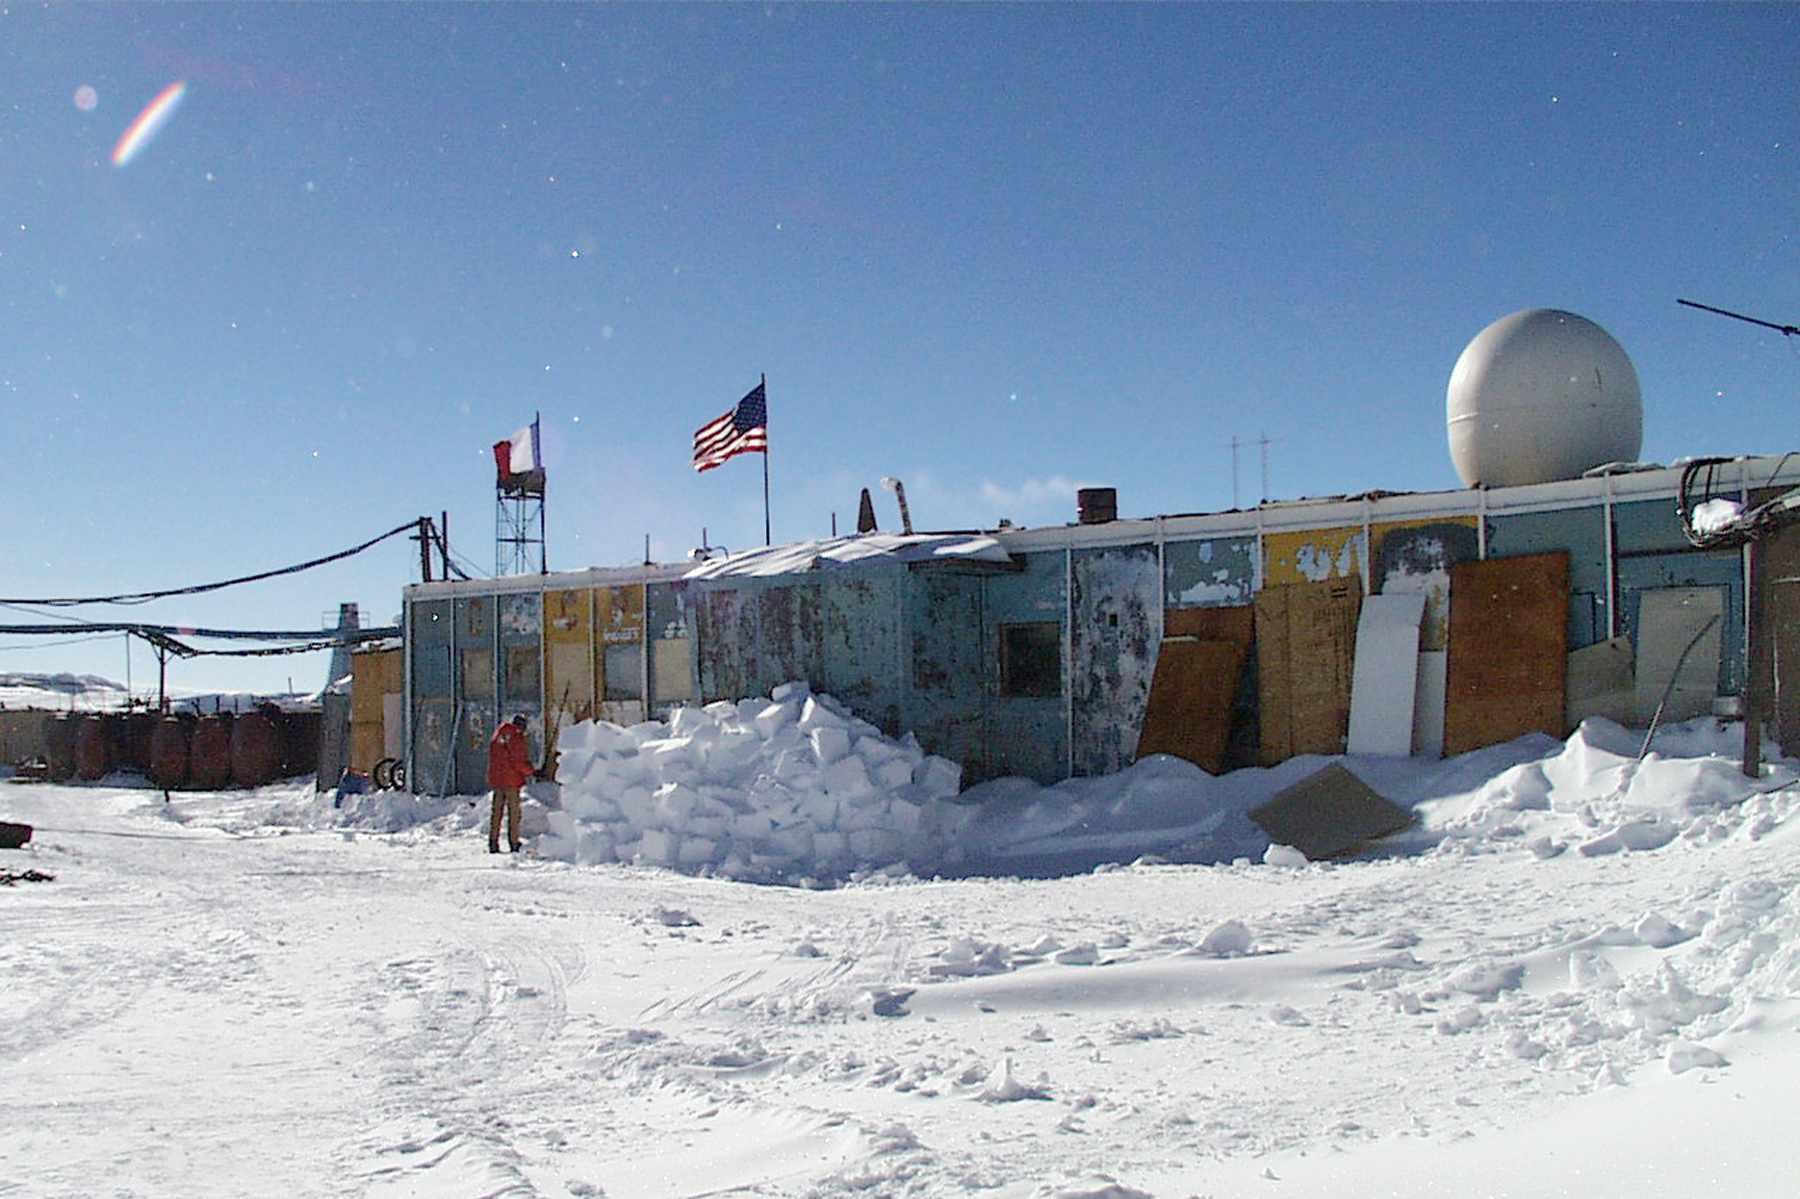 Vostok Station, Antarctica, covered in snow